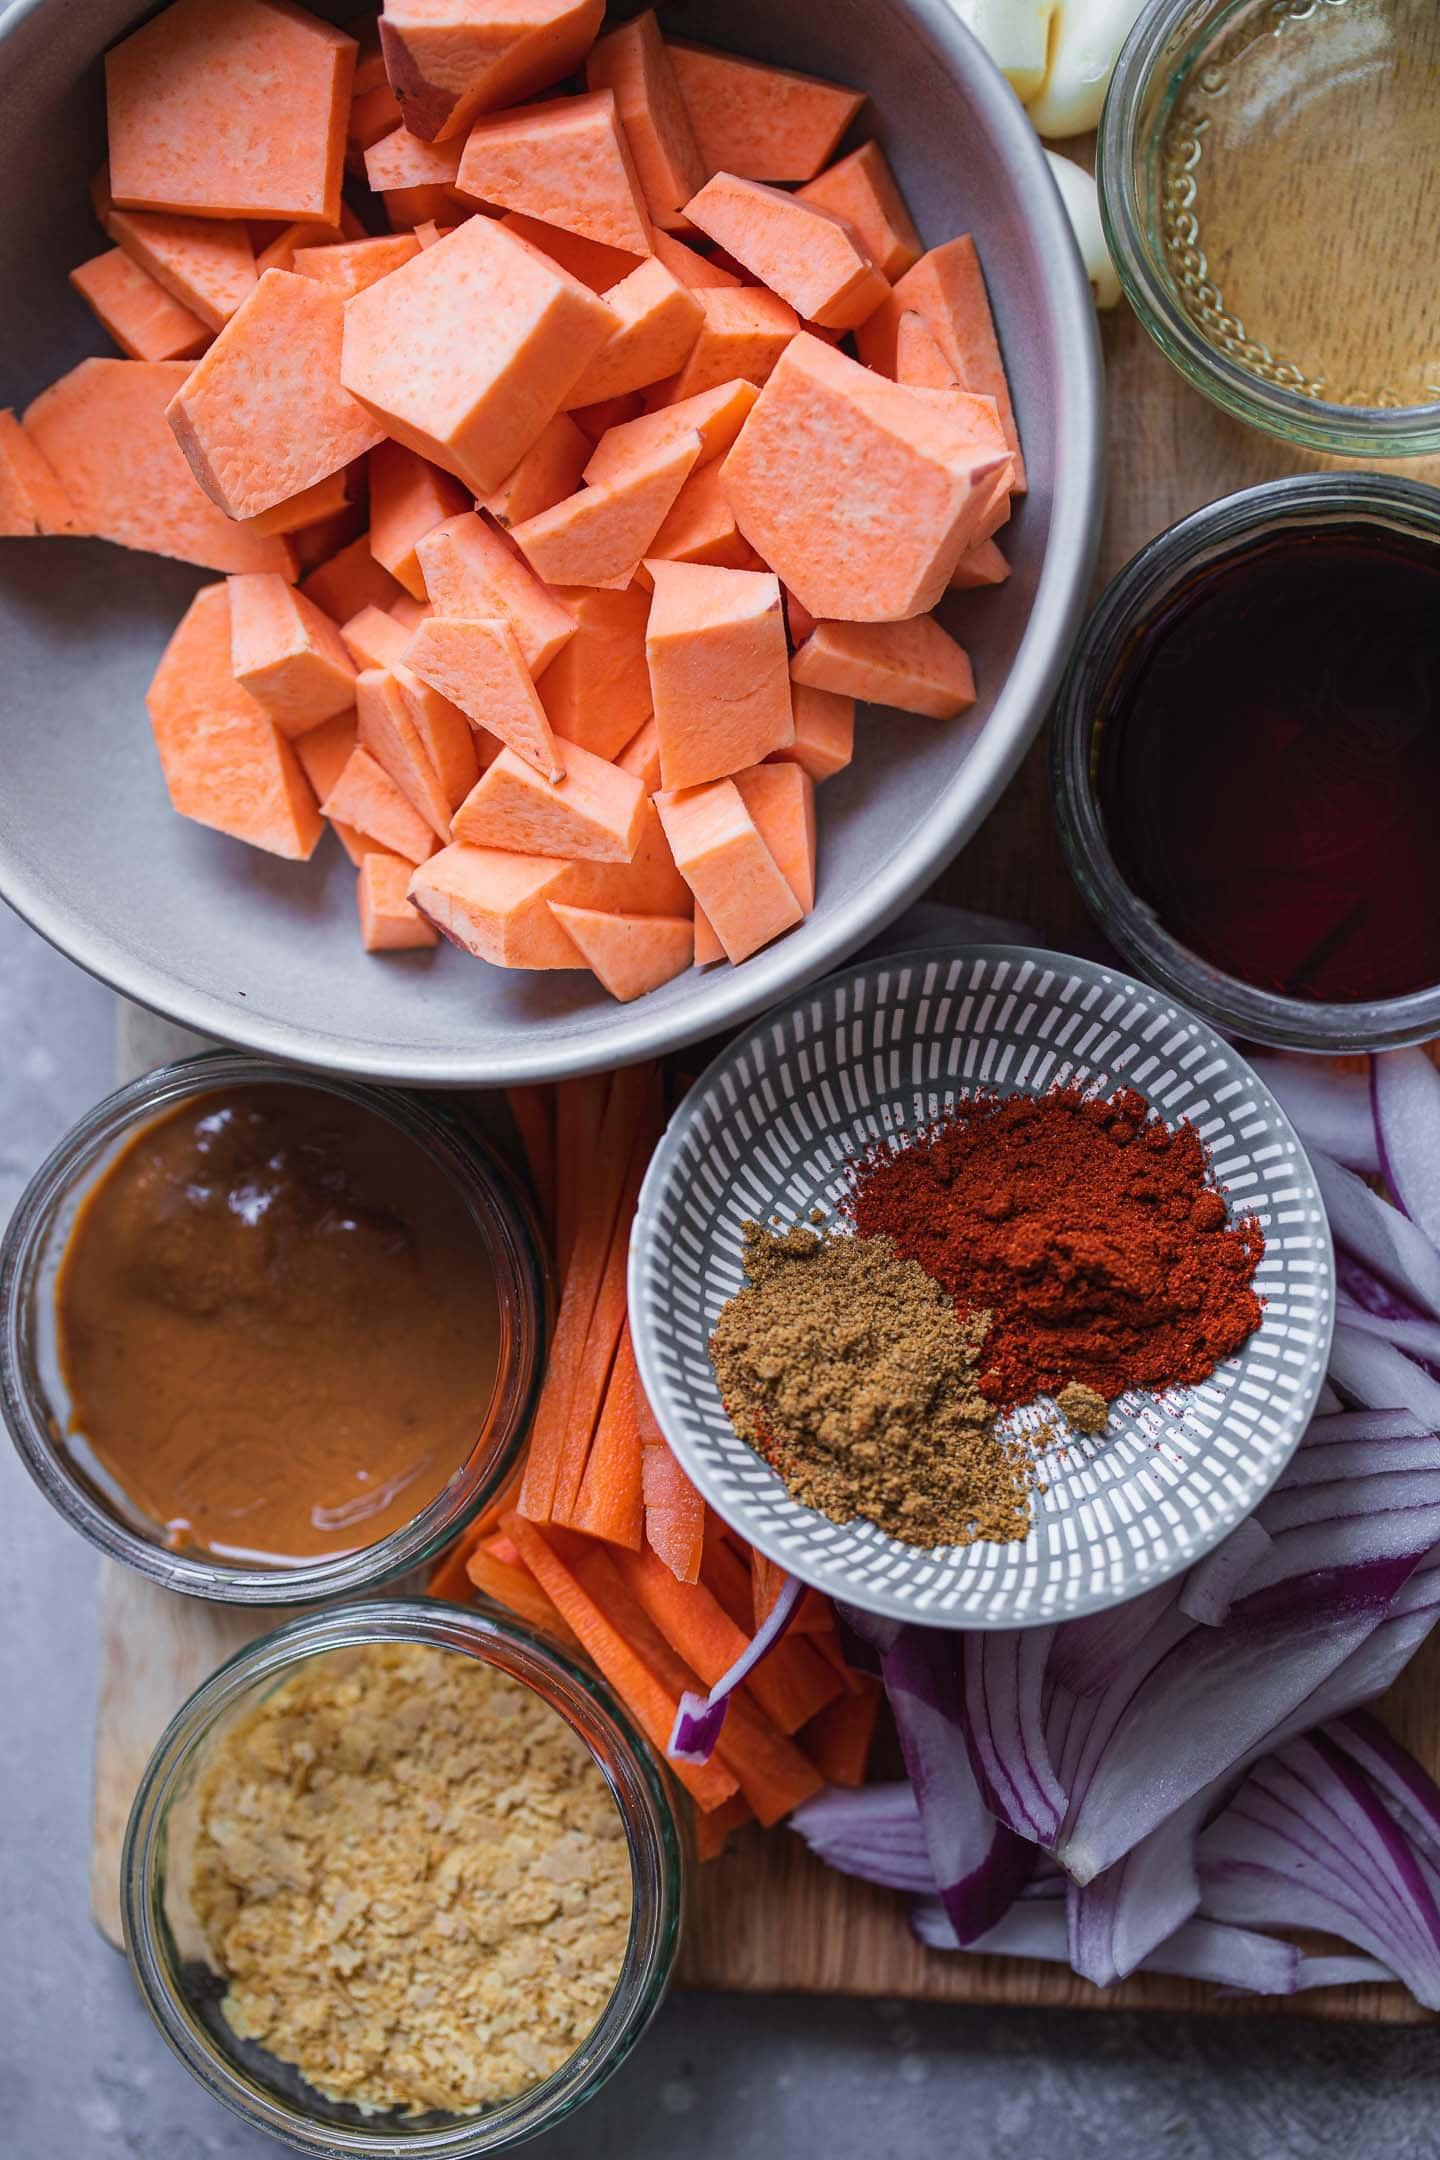 Ingredients for vegan sweet potato casserole